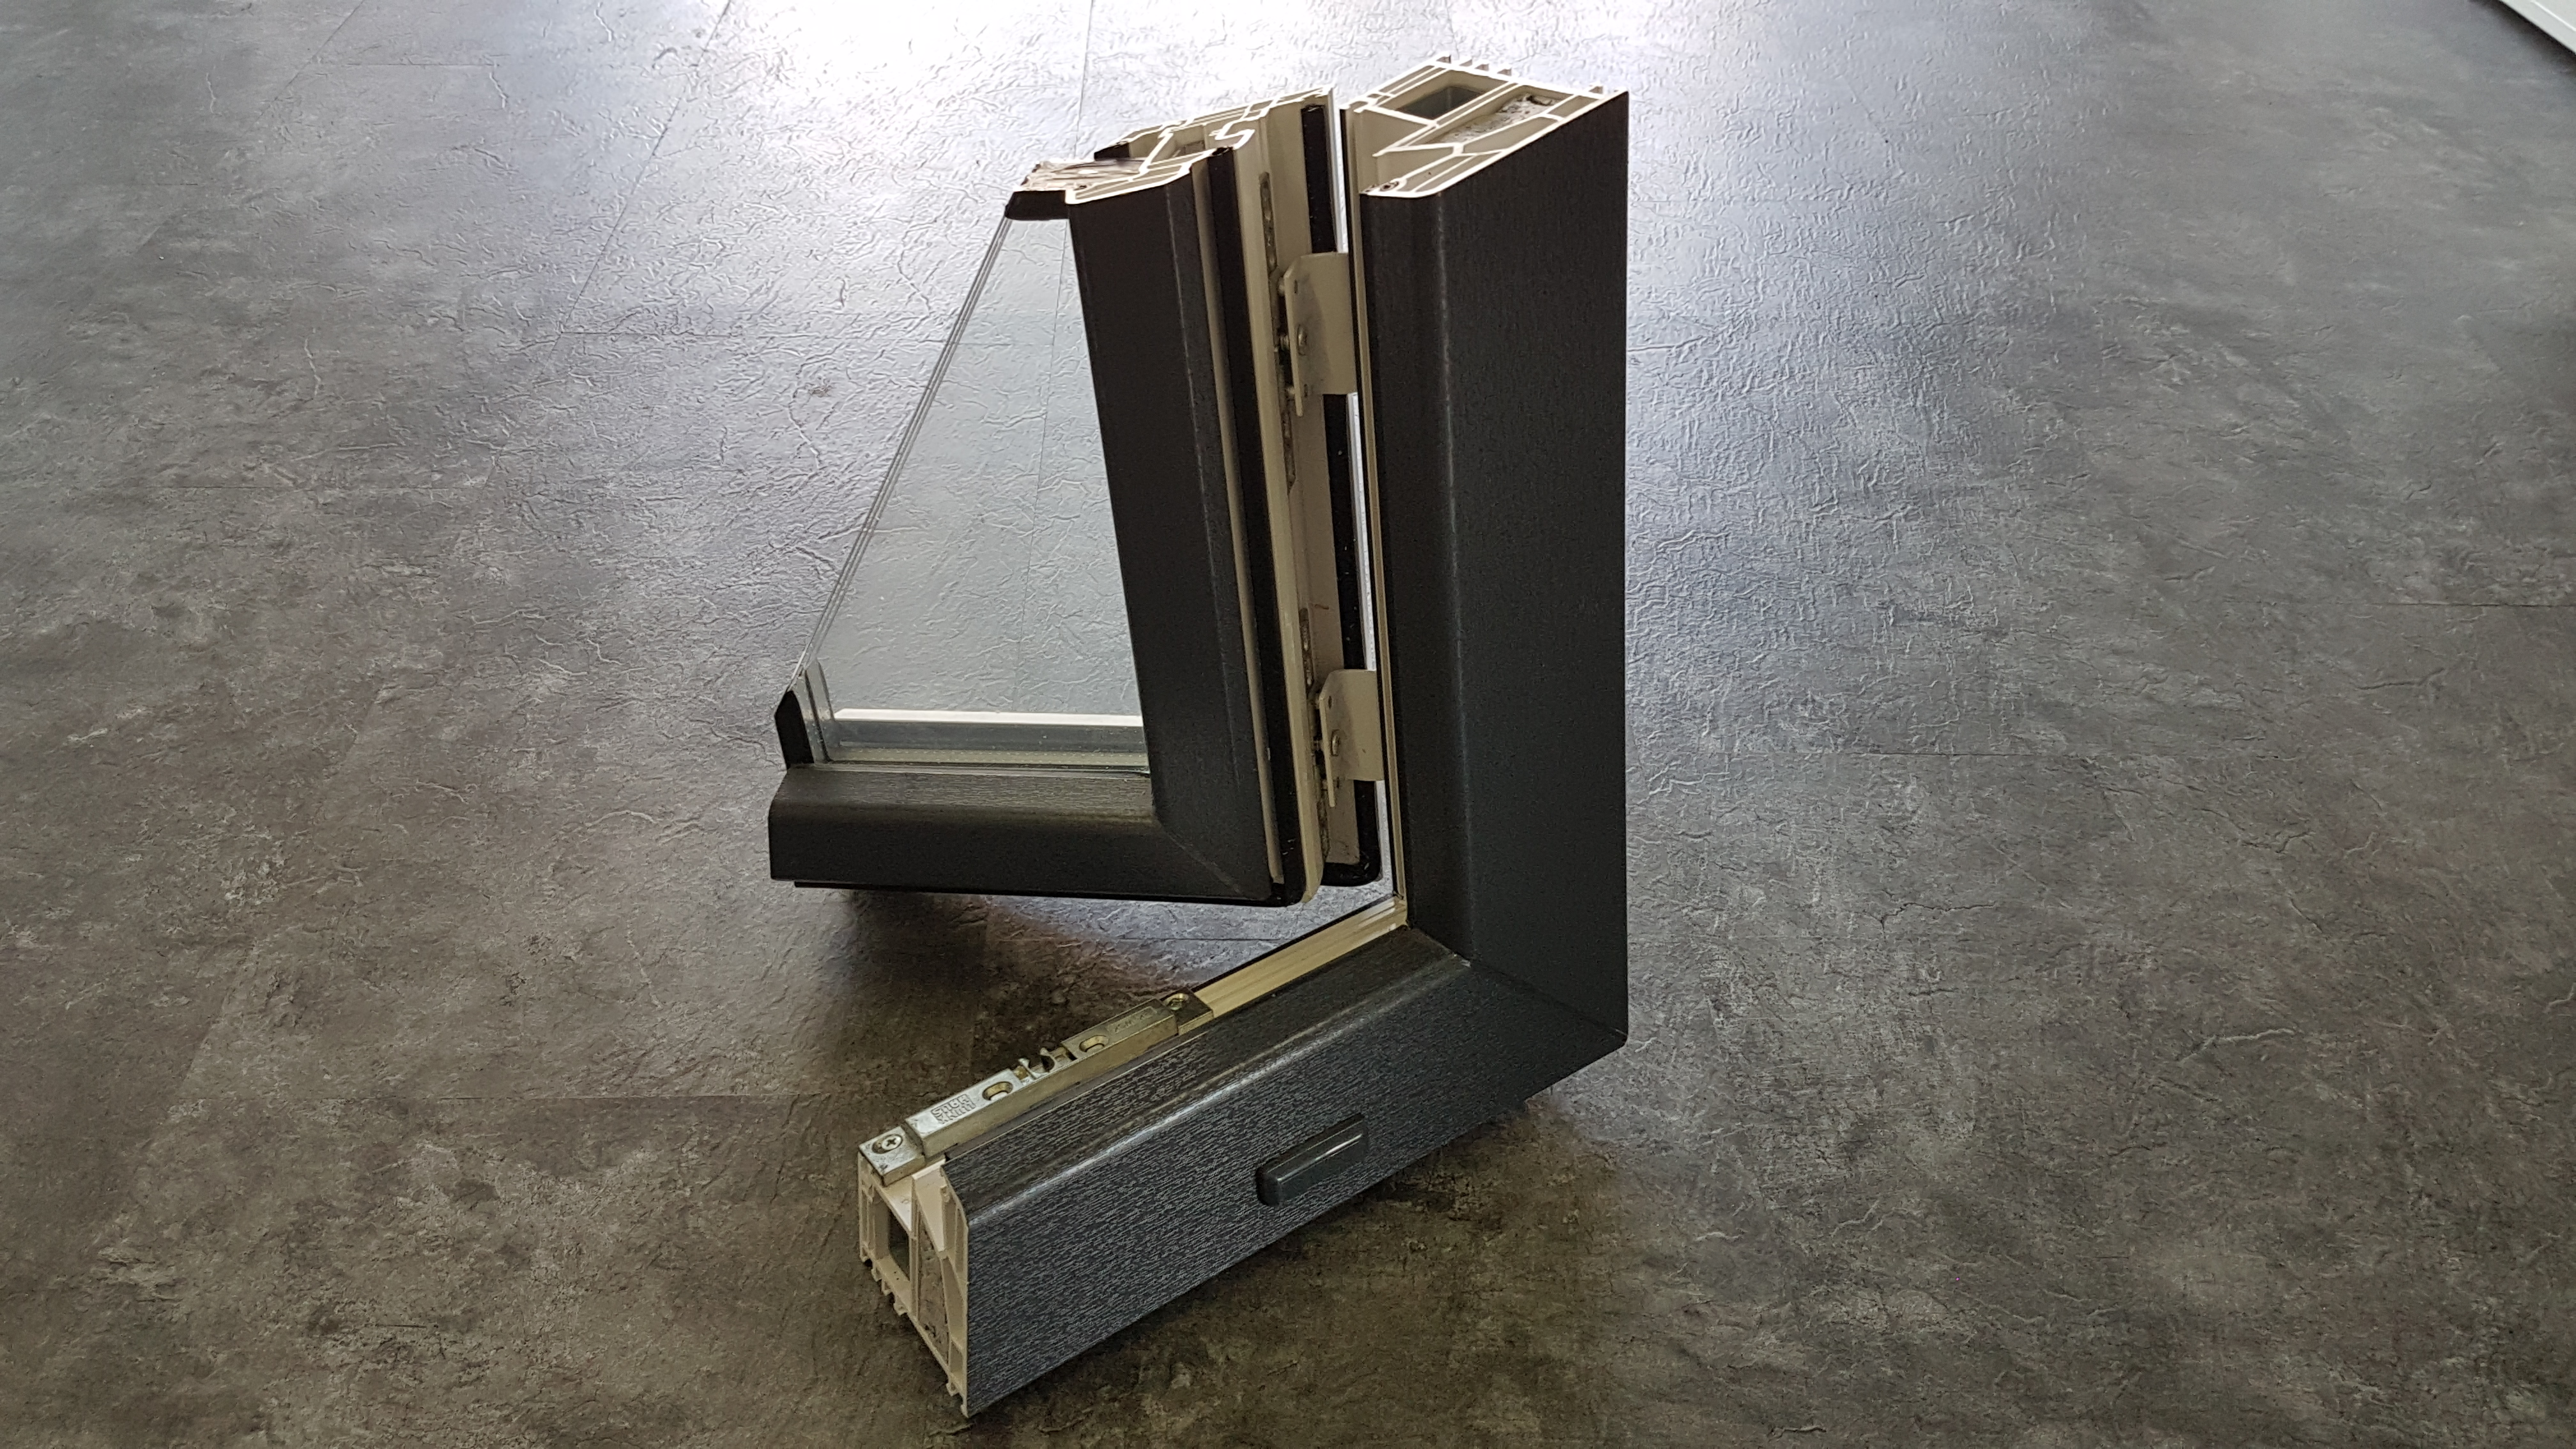 kunststofffenster folieren ForFenster Folieren